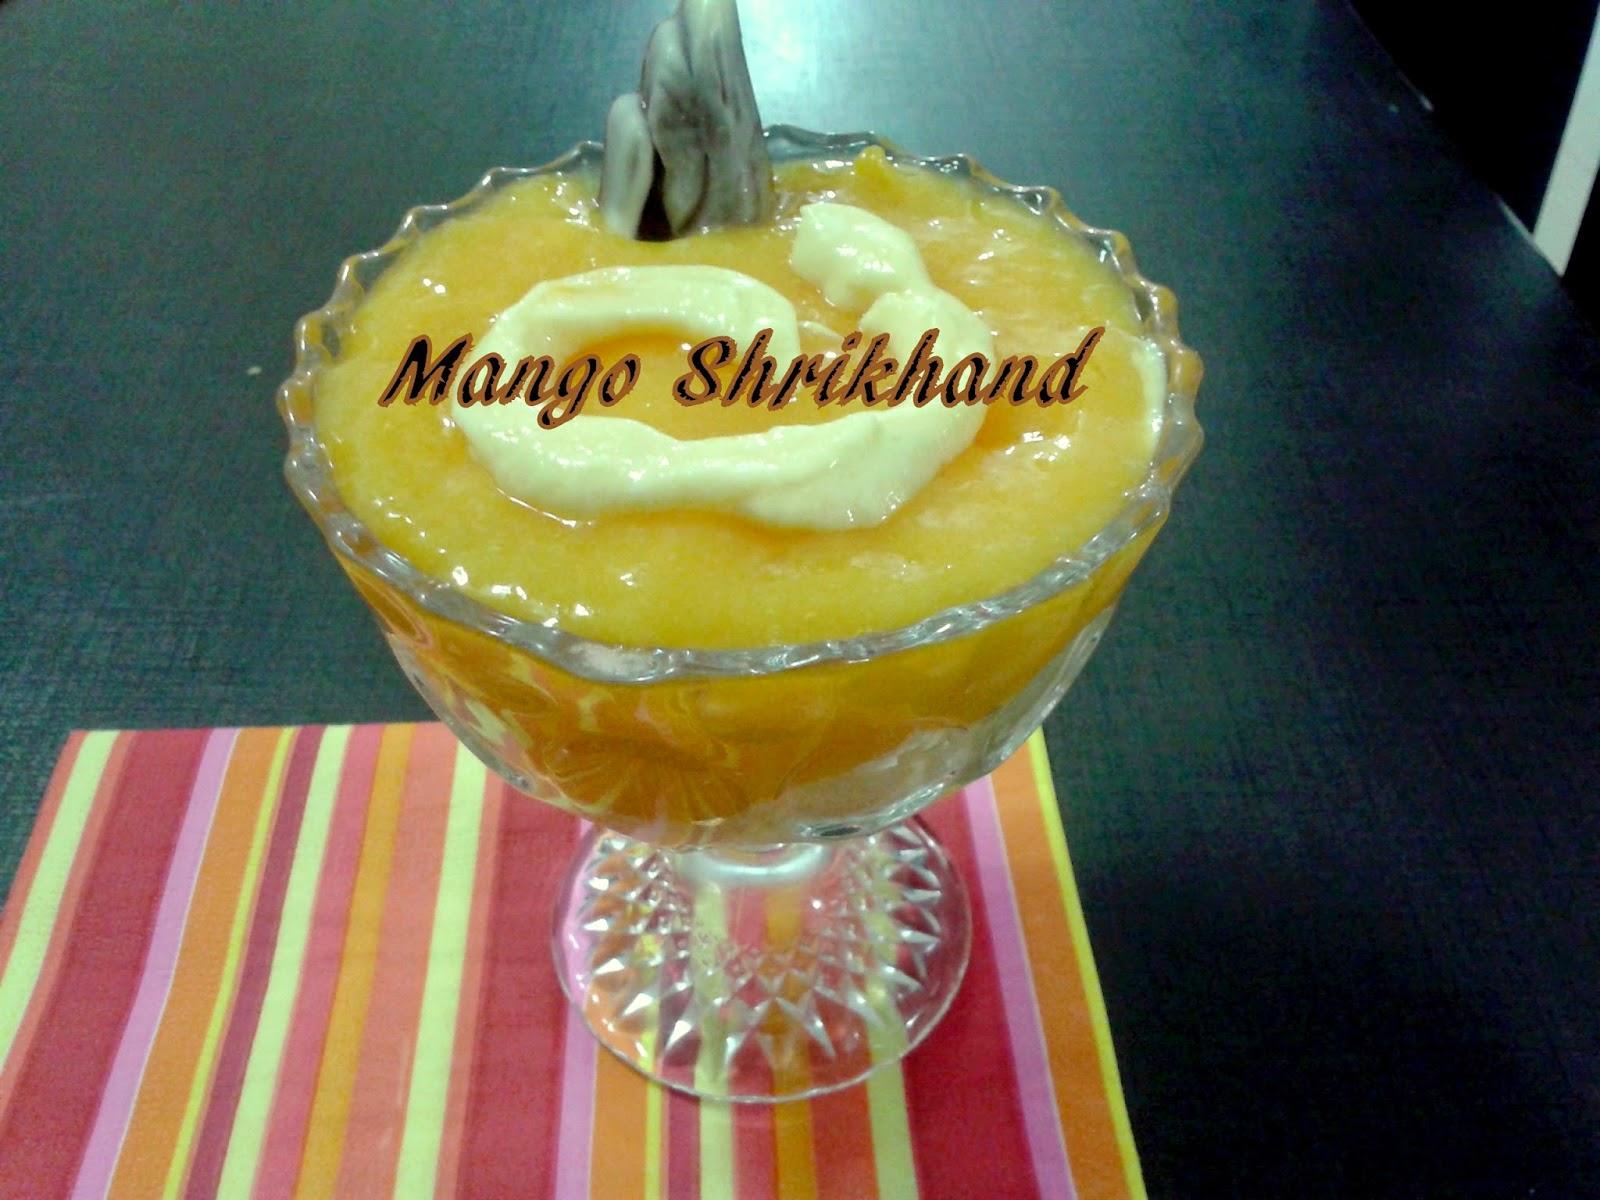 http://agoodstuff.blogspot.in/2014/05/mango-shrikhand.html